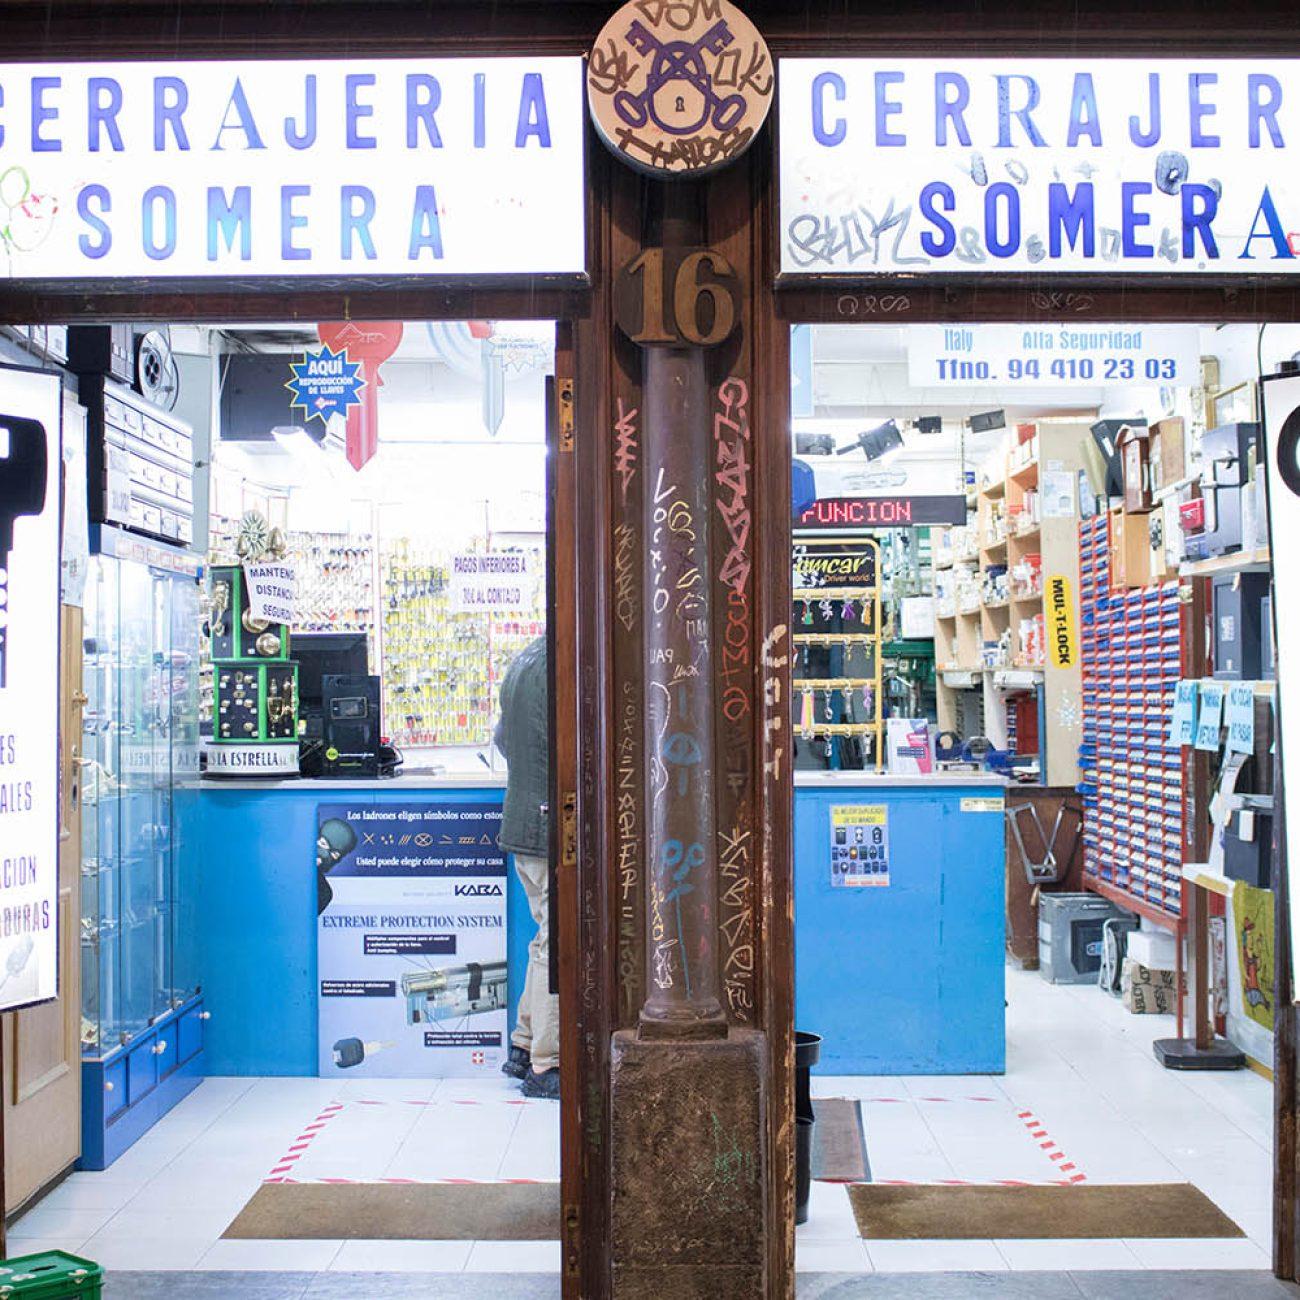 CERRAJERIA SOMERA